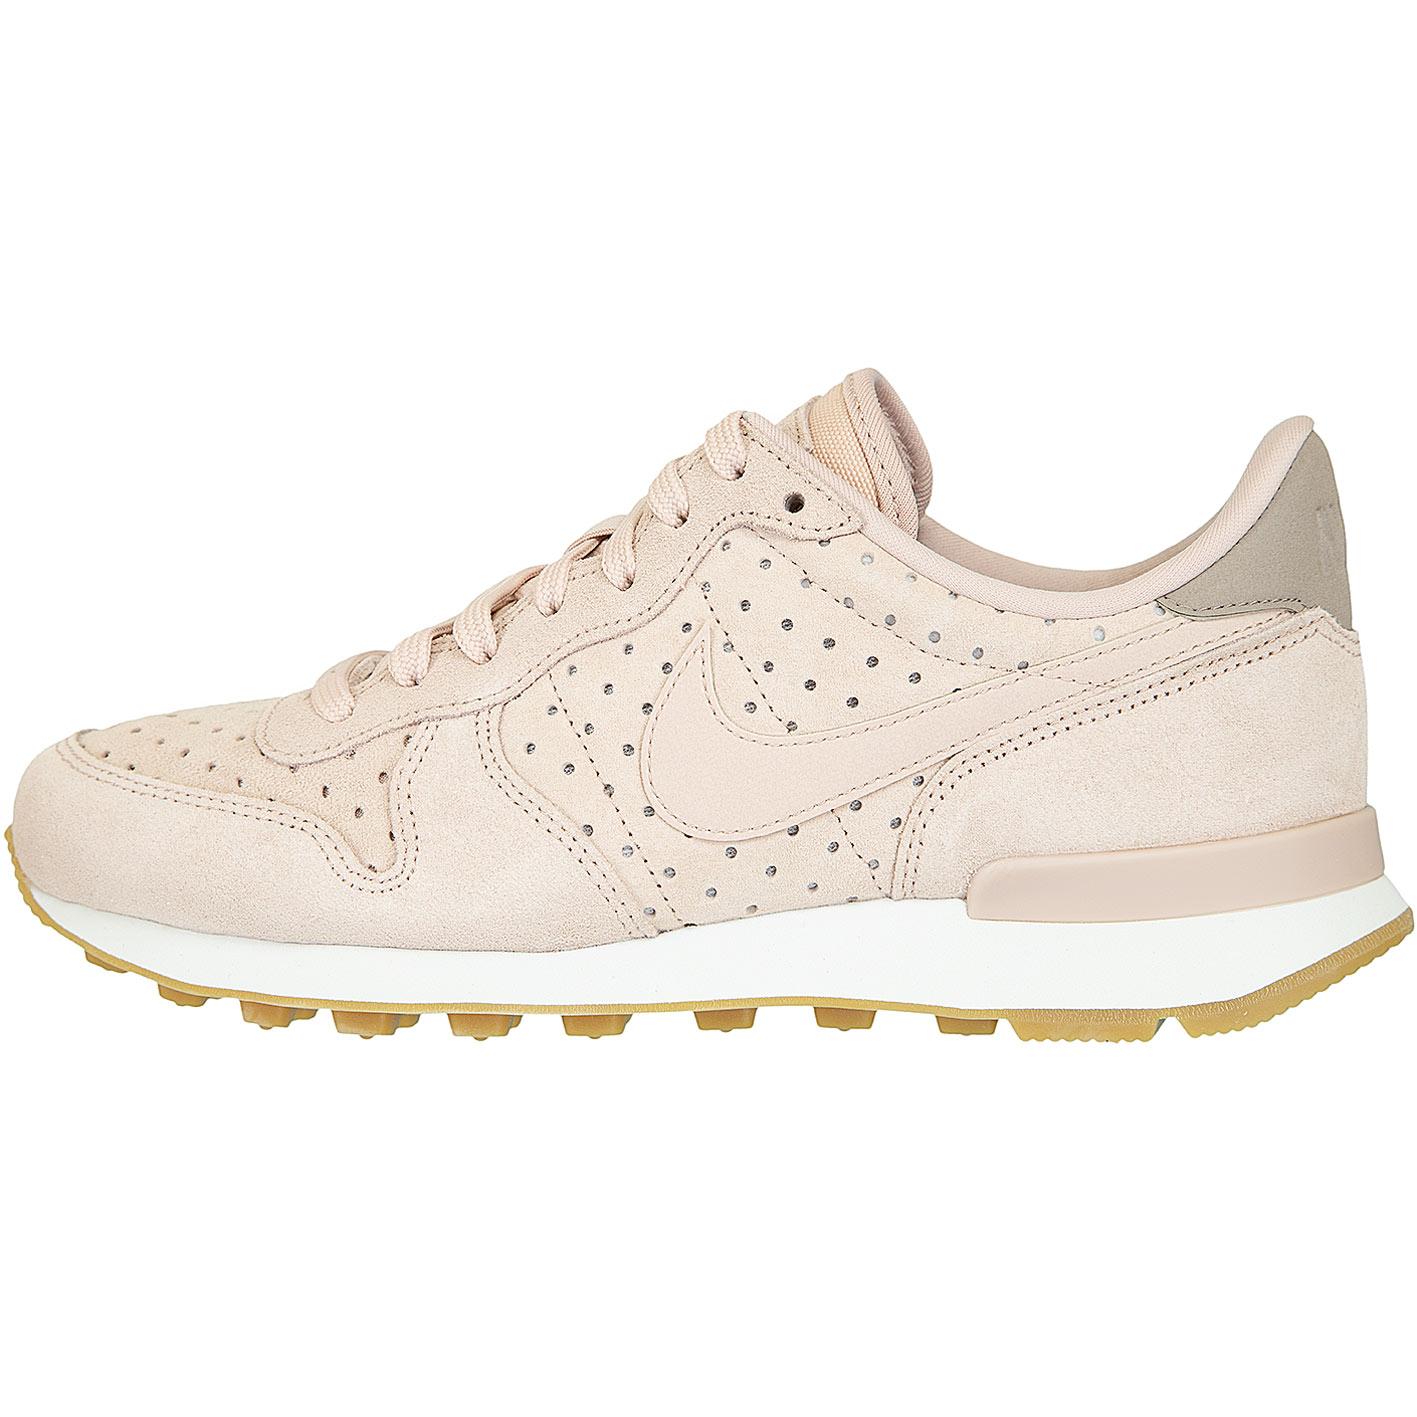 uk availability 41e0a 901f9 Nike Damen Sneaker Internationalist Premium rosa